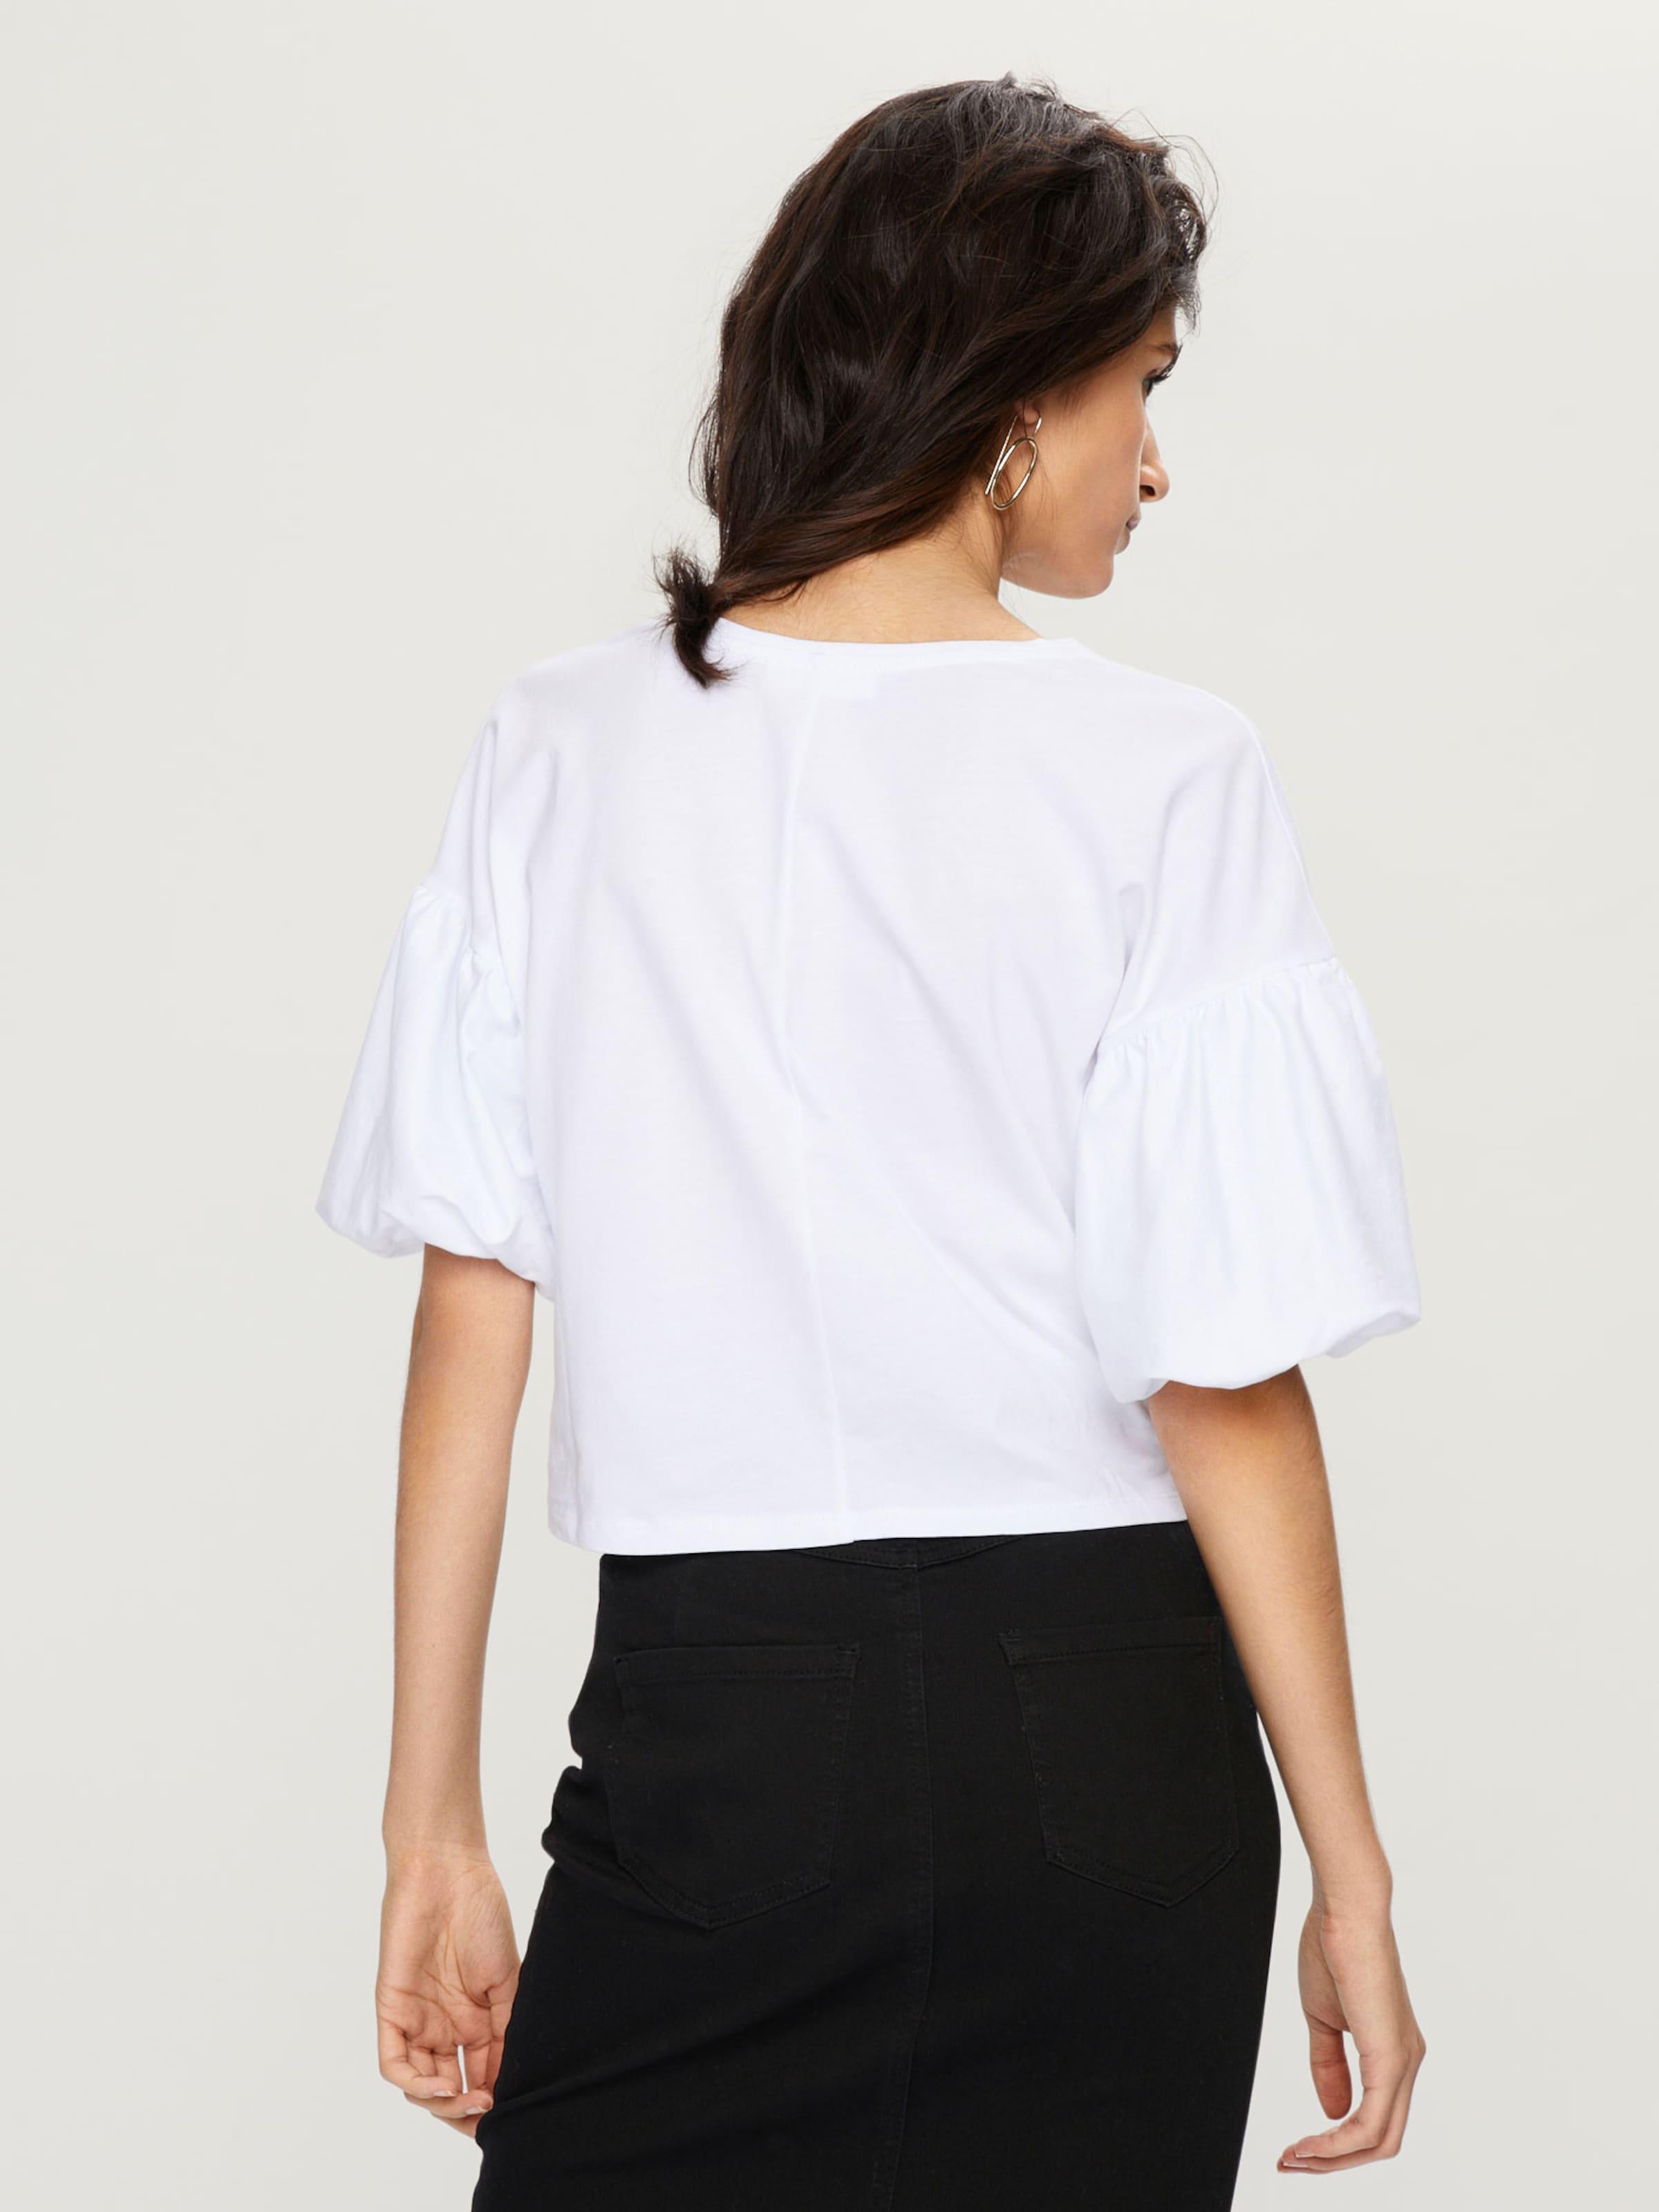 T Blanc 'raja' En Edited shirt nN80wm